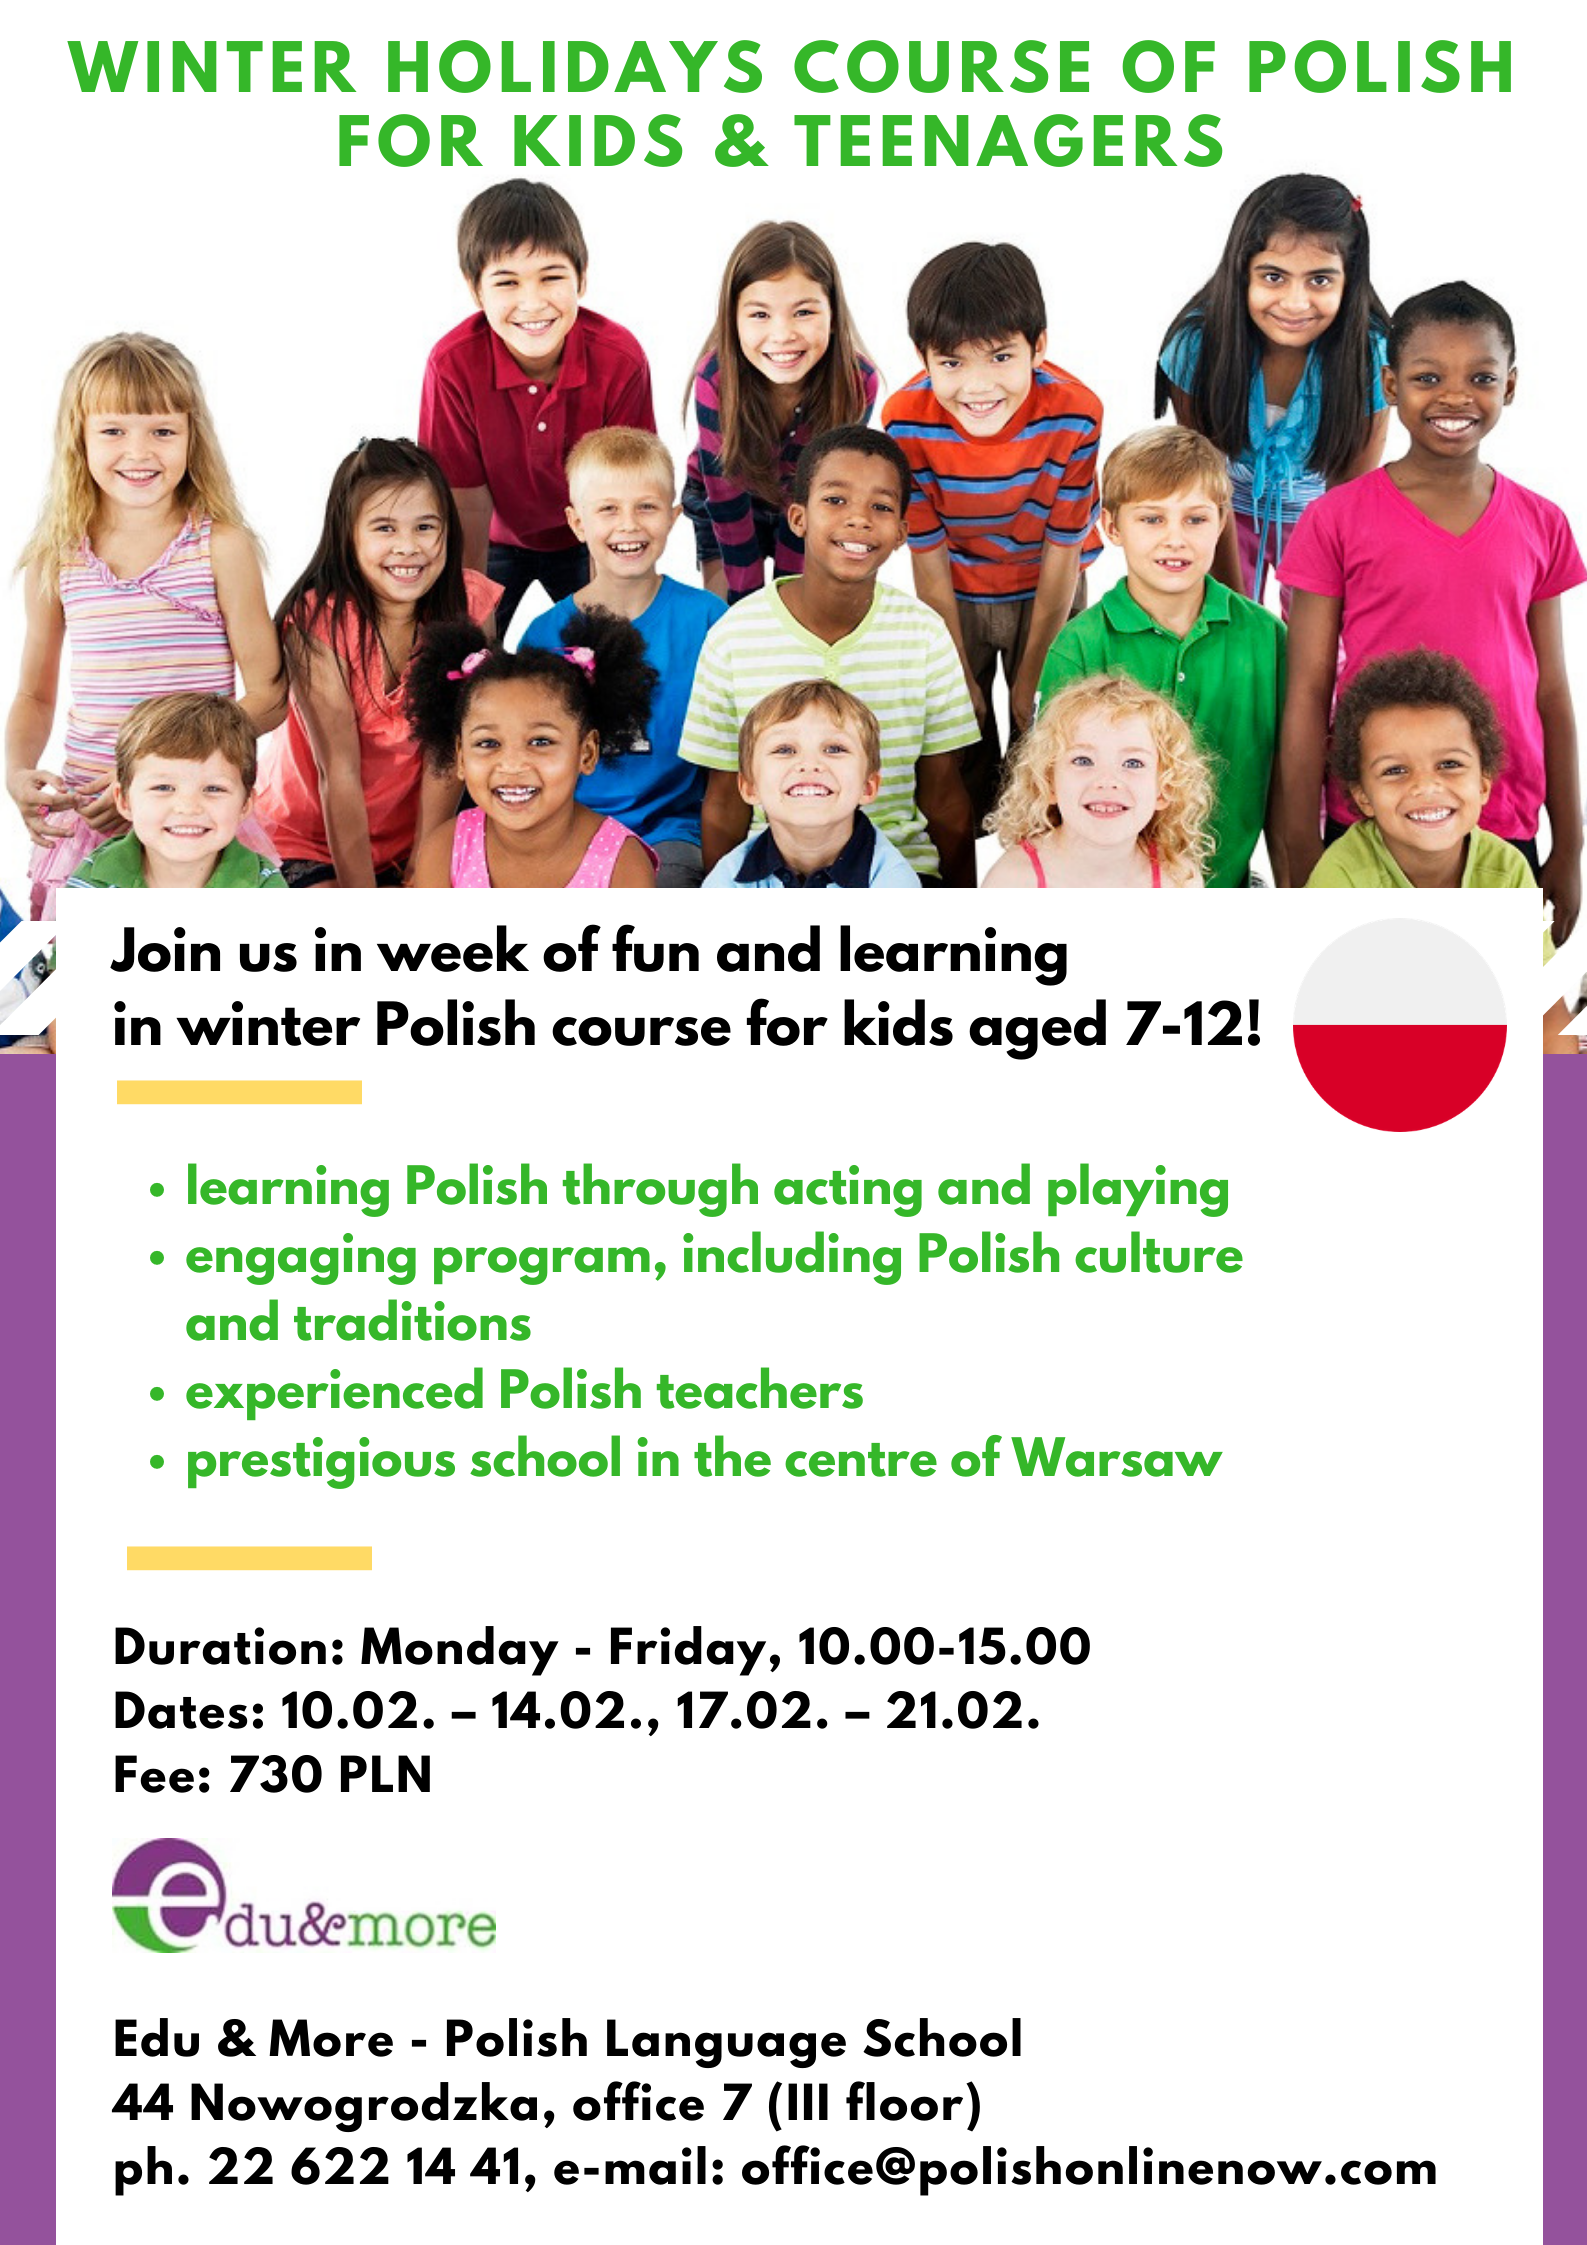 Winter holidays, Polish for kids